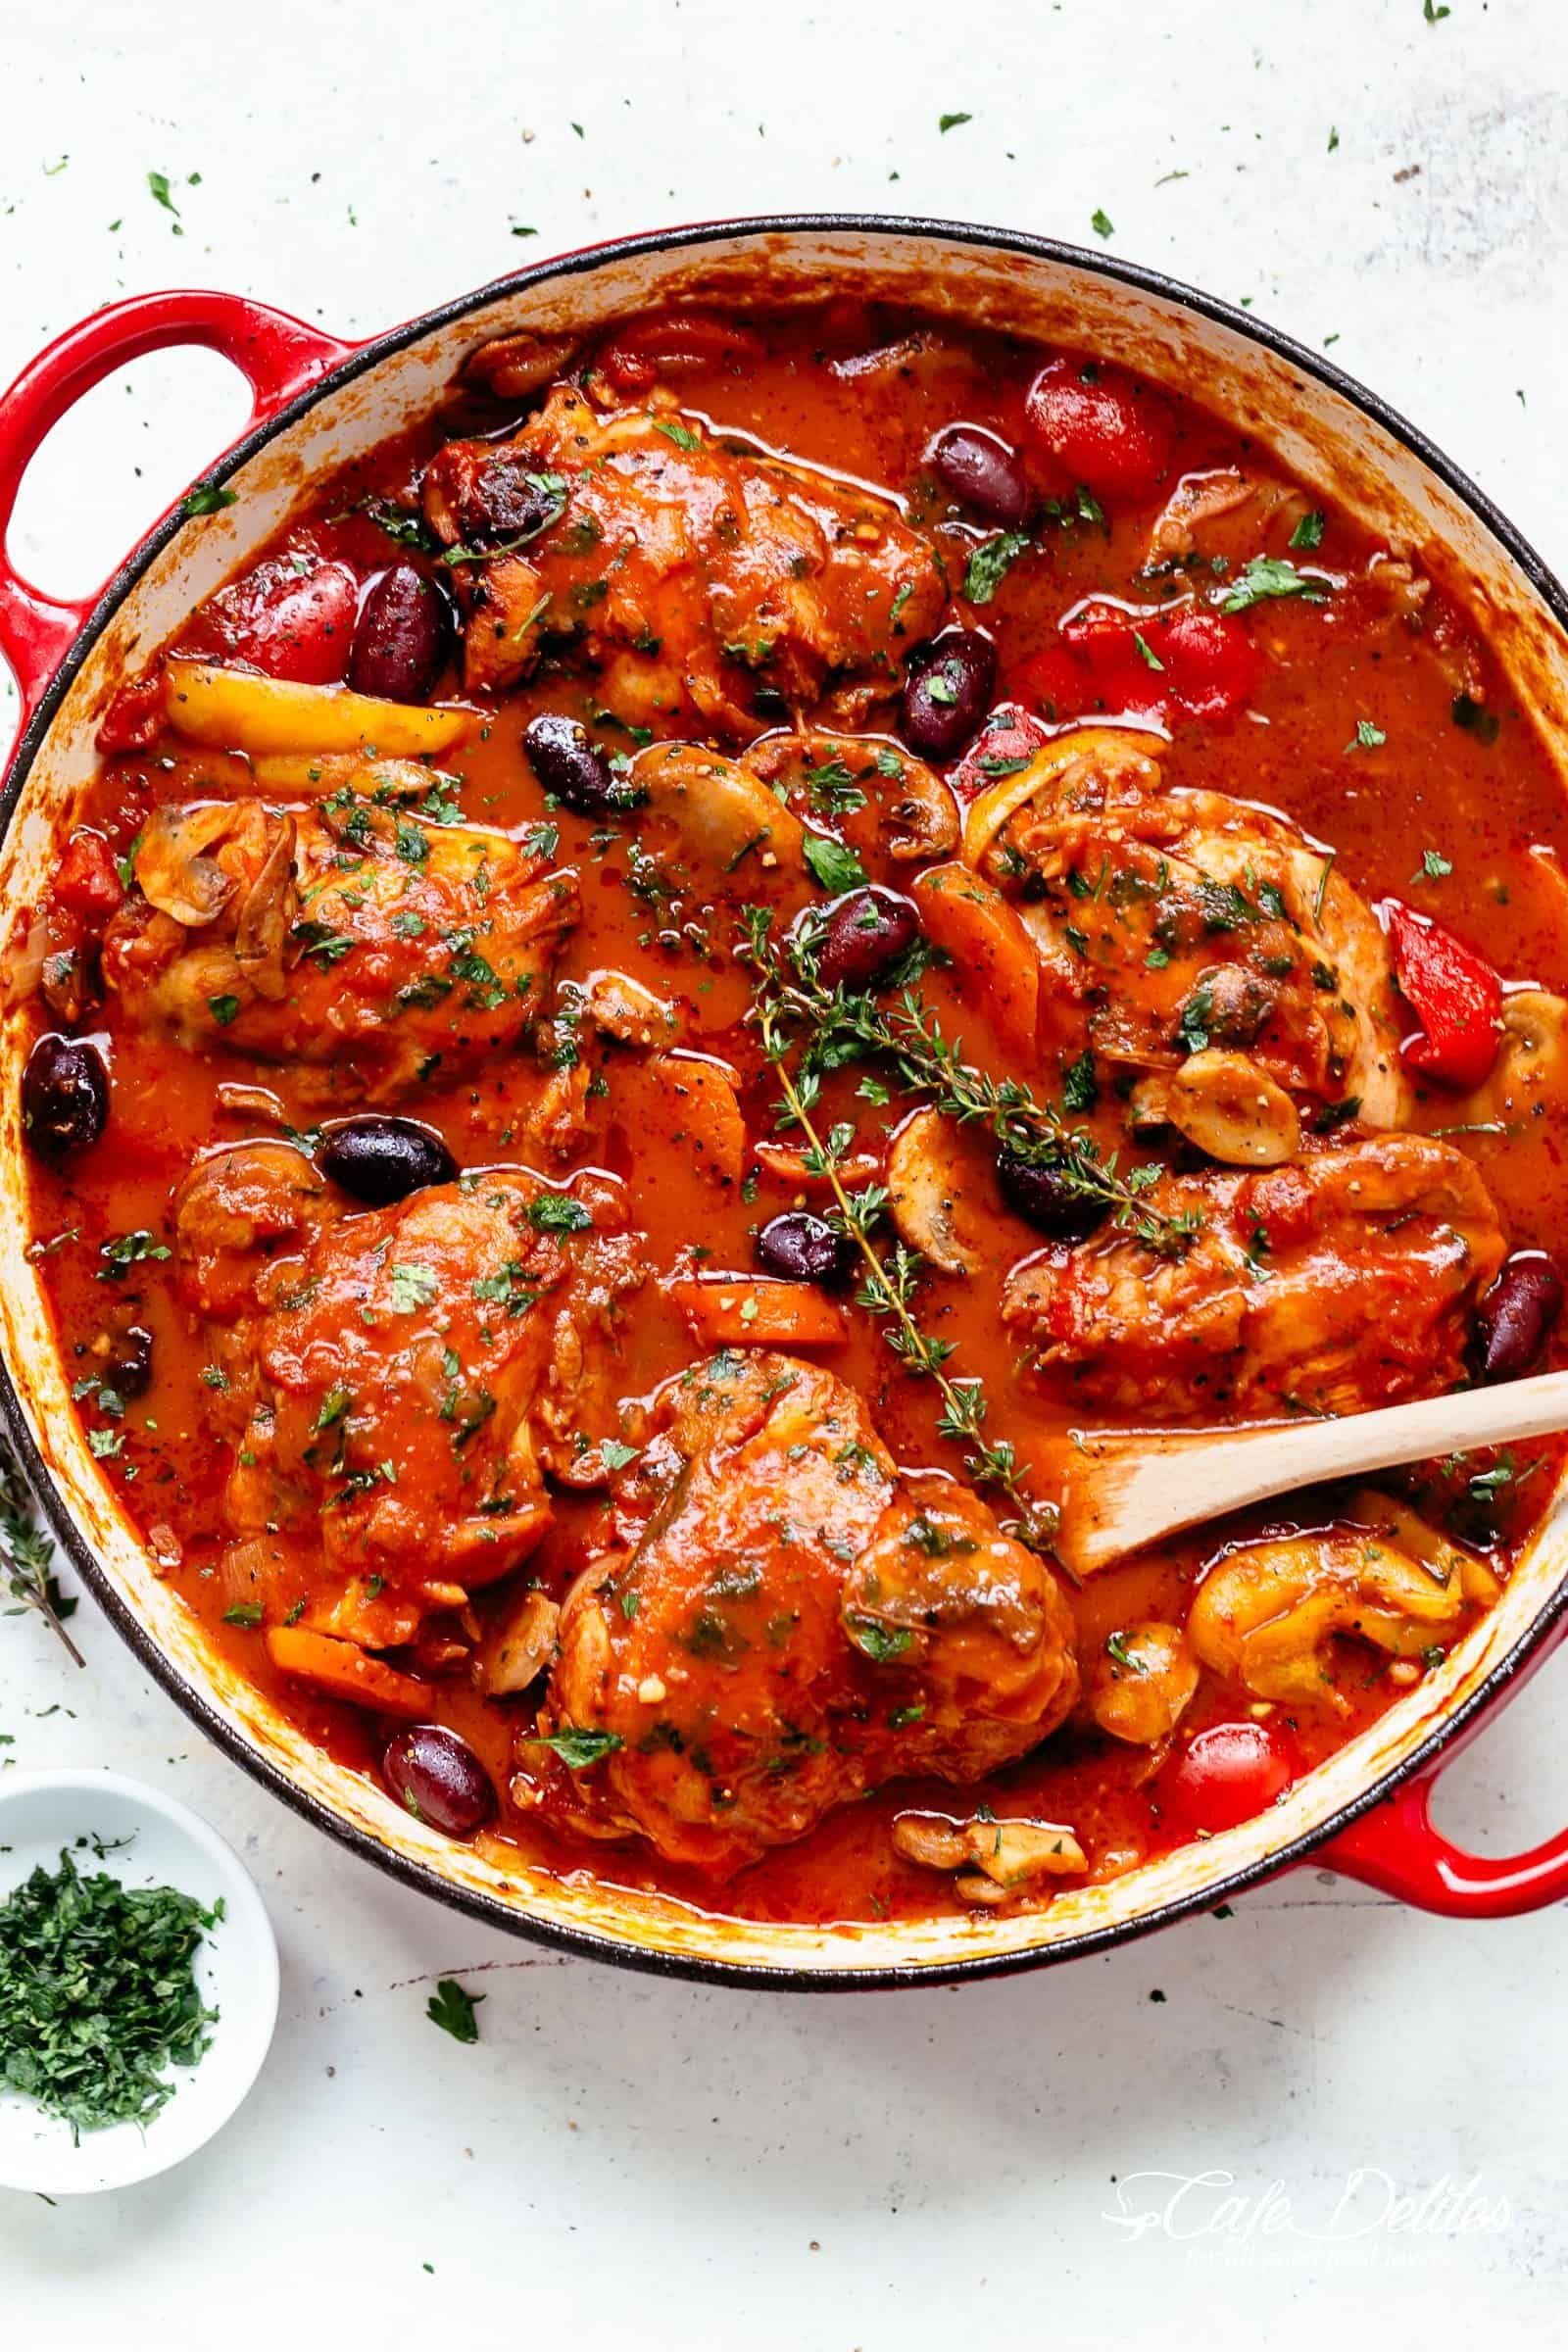 Raves The Best Chicken Cacciatore In A Rich Rustic Sauce W Chicken Falling Off The Bone I Cacciatore Recipes Italian Comfort Food Chicken Cacciatore Recipe